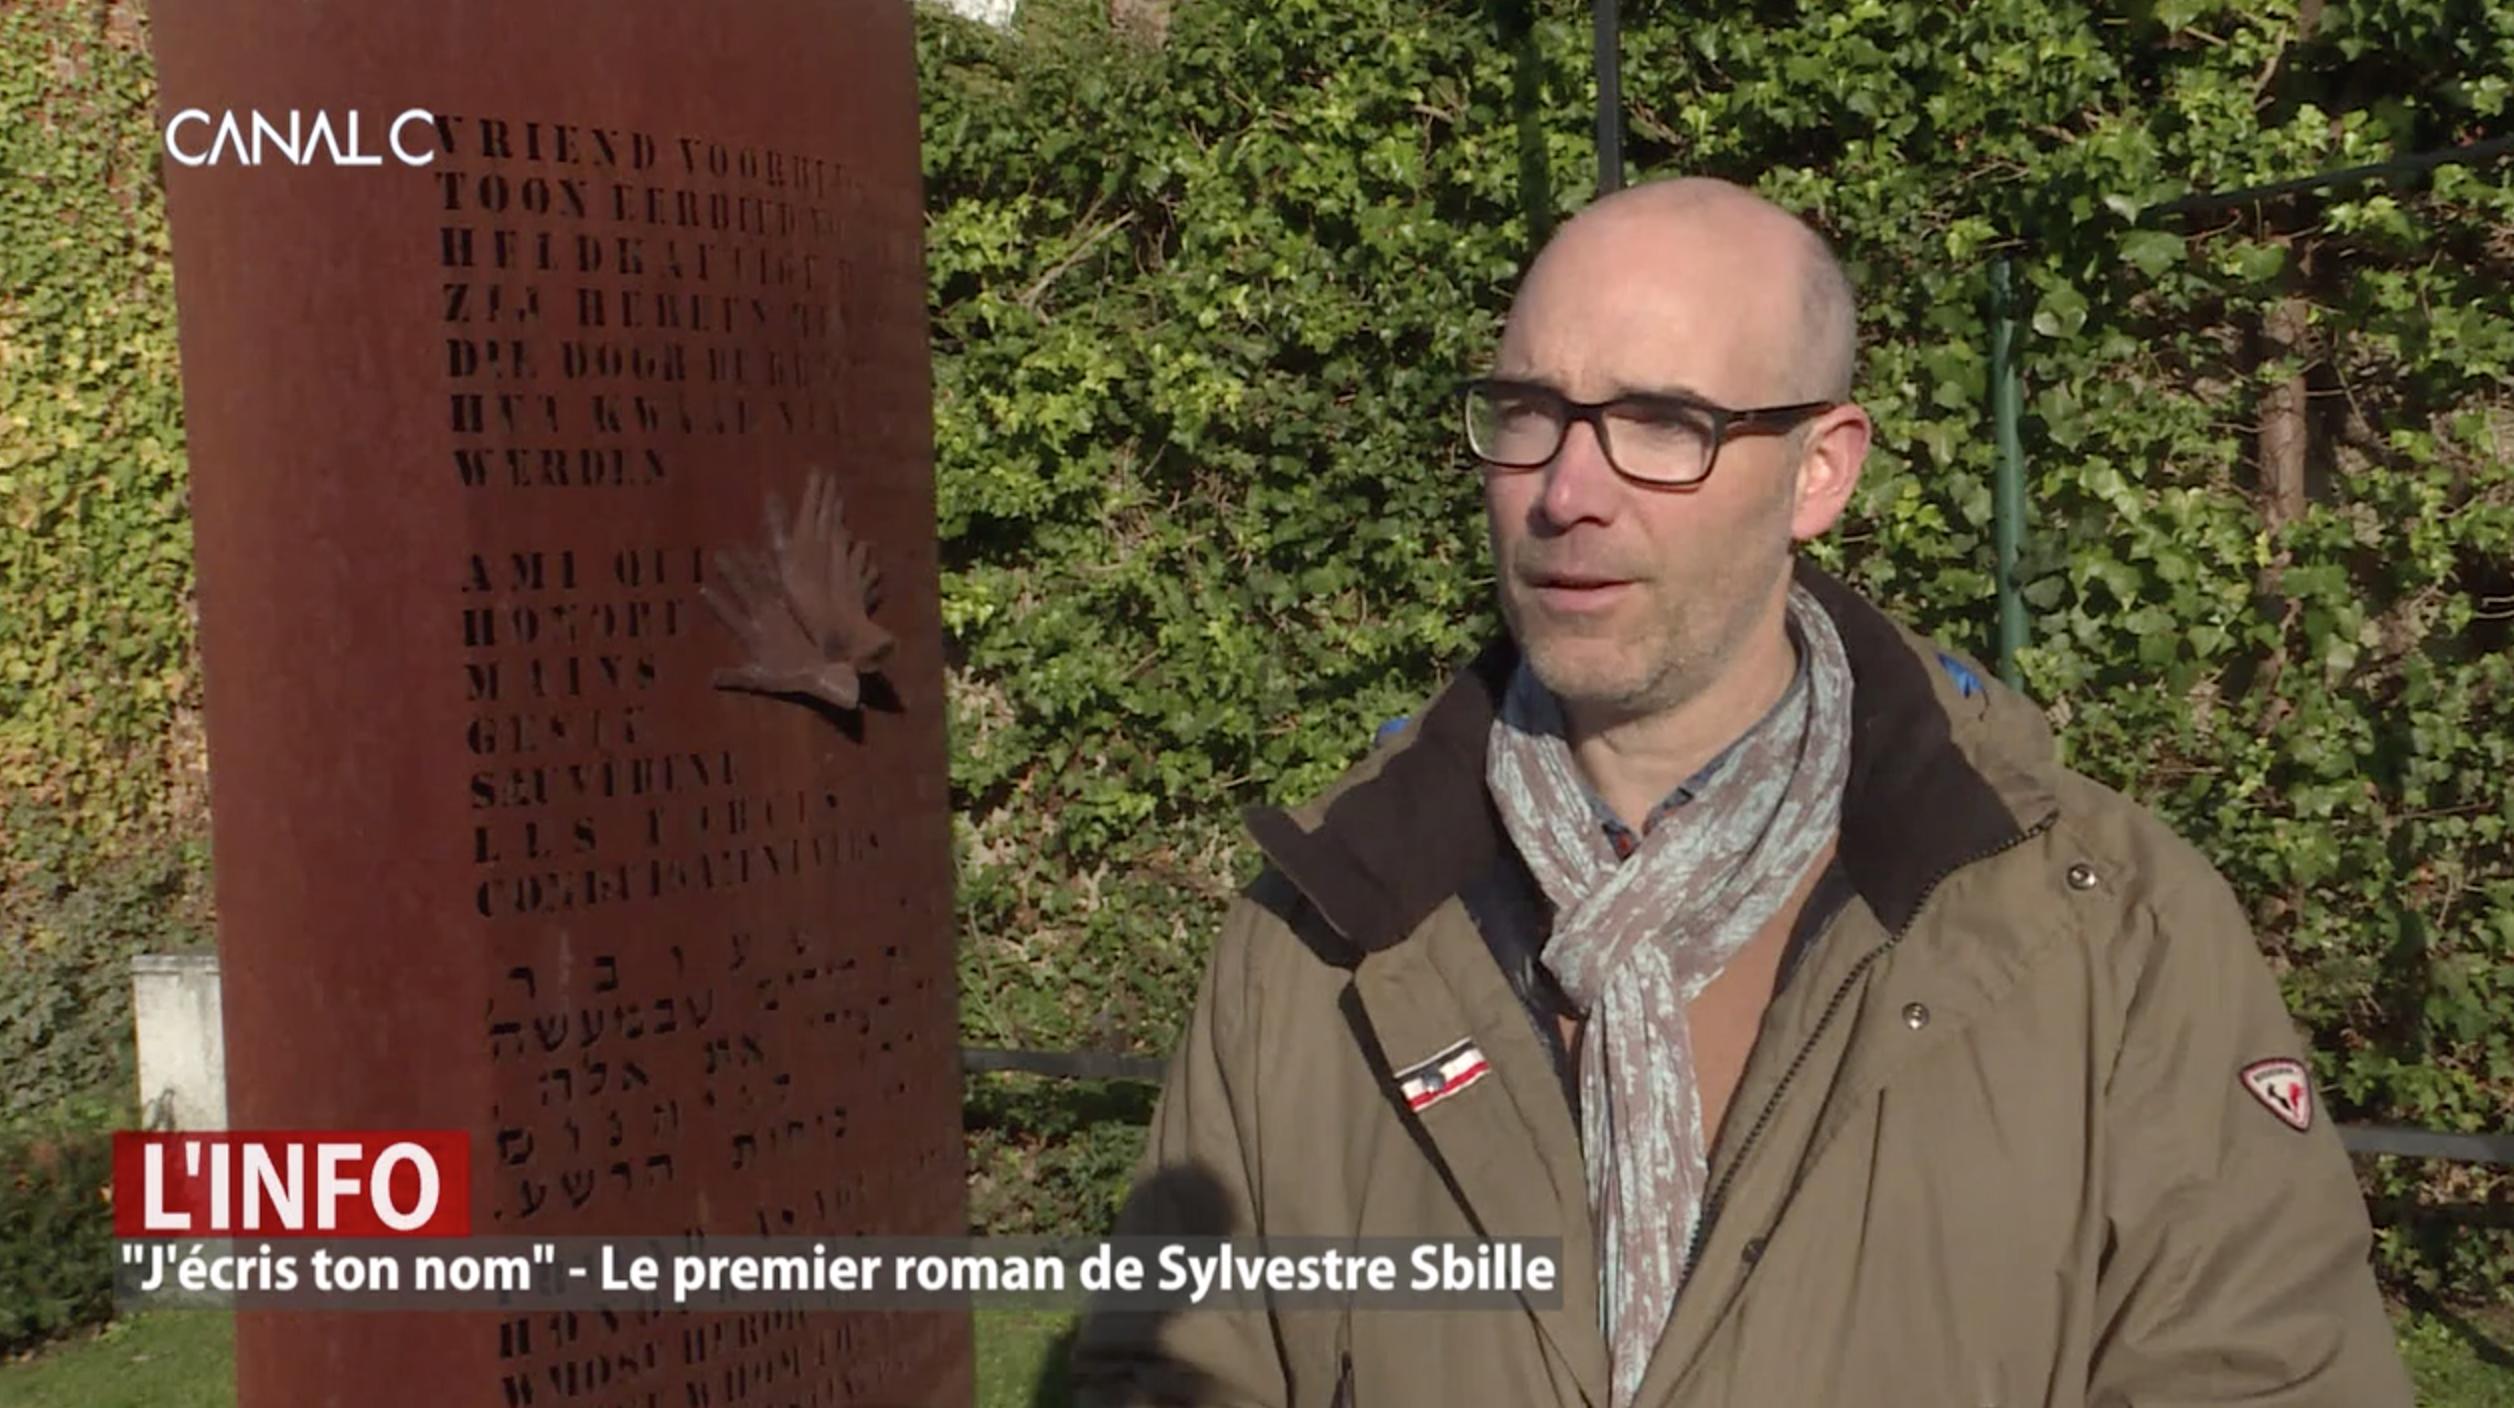 Sylvestre Sbille devant monument